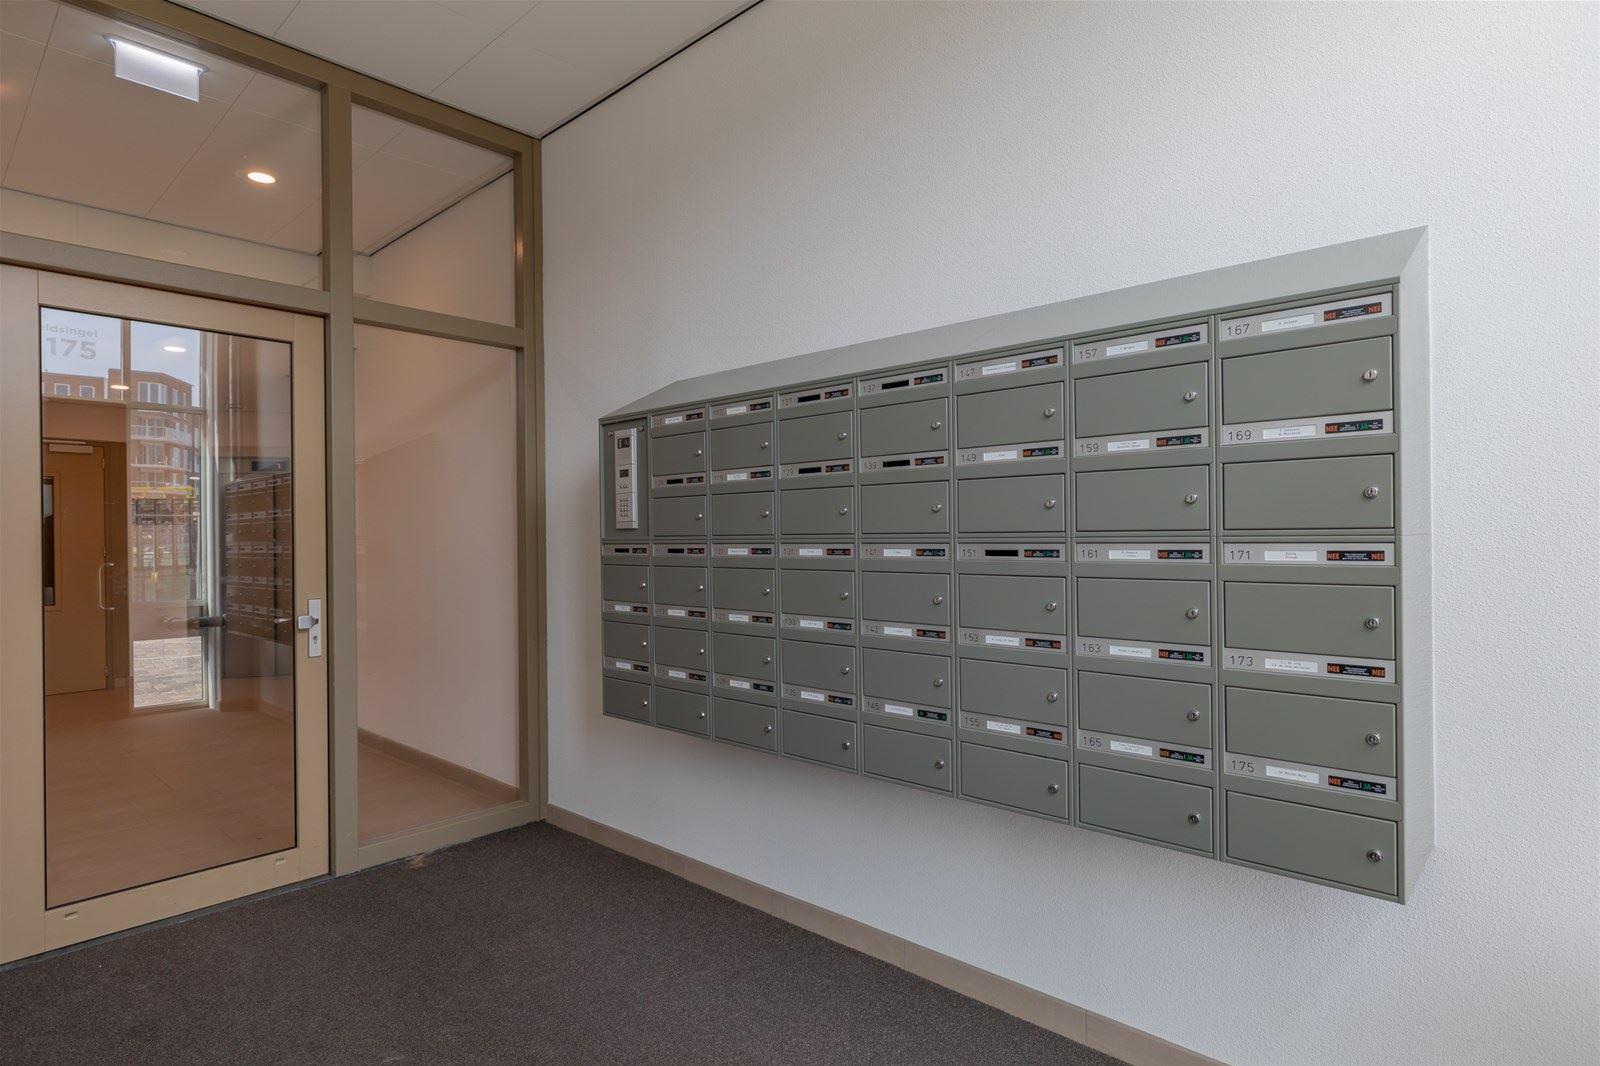 Apartment for sale: gerrit rietveldsingel 173 1112 zb diemen [funda]